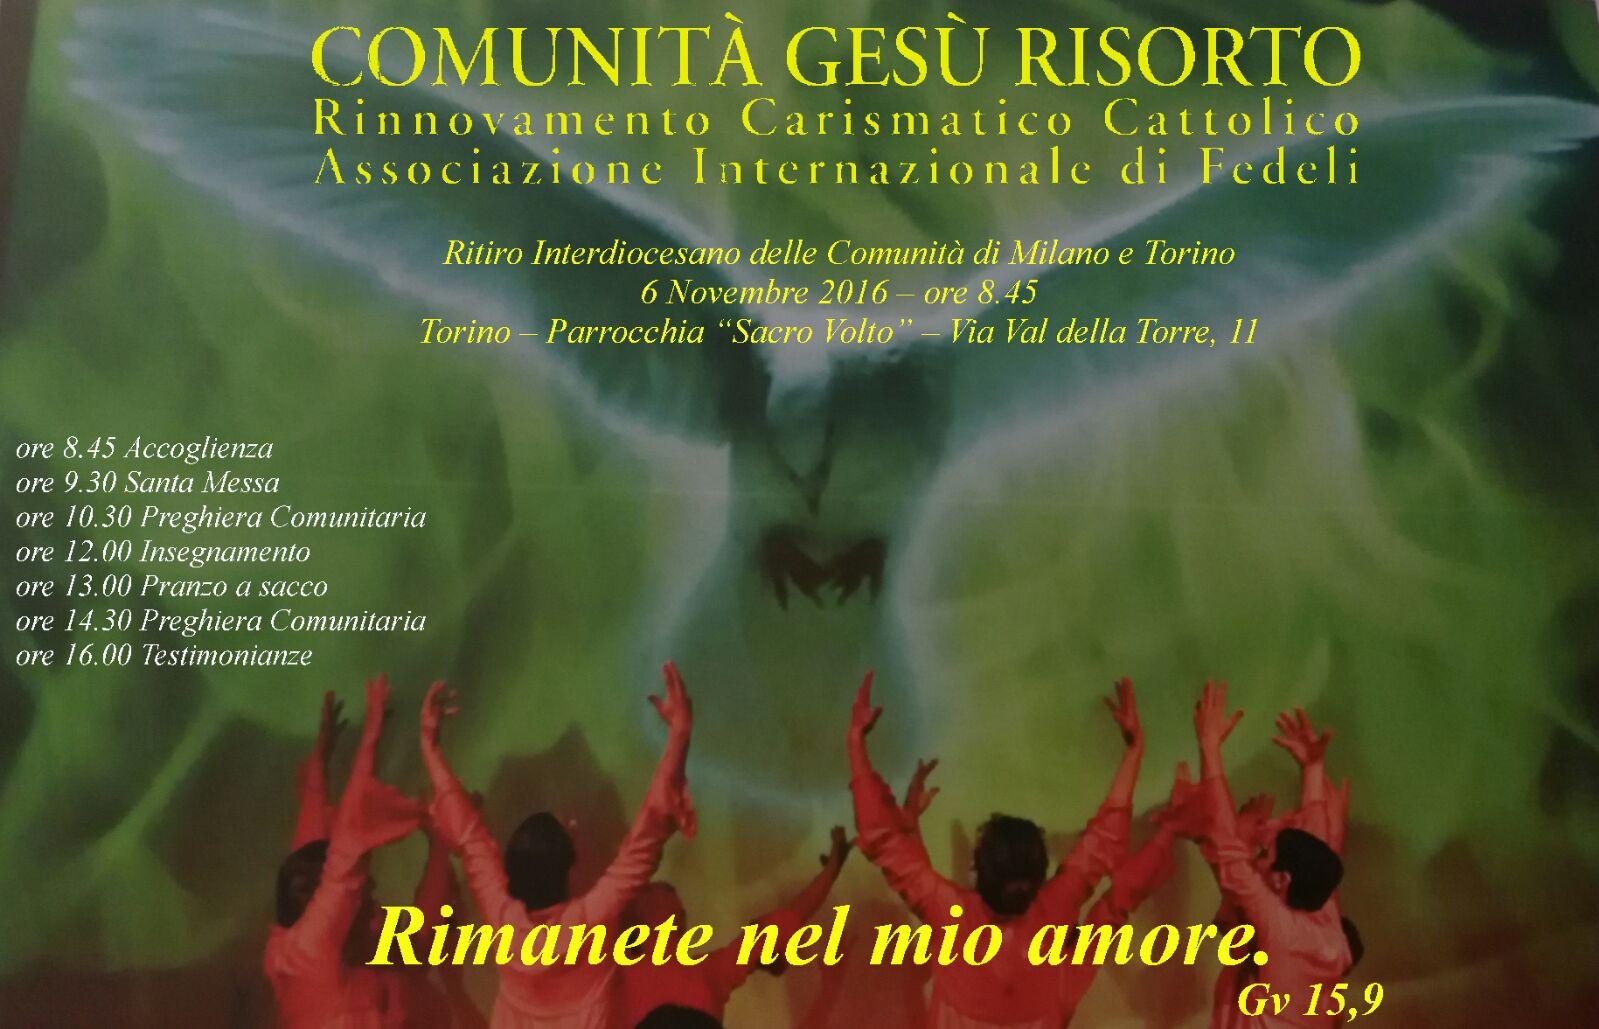 Ritiro Interdiocesano Milano e Torino